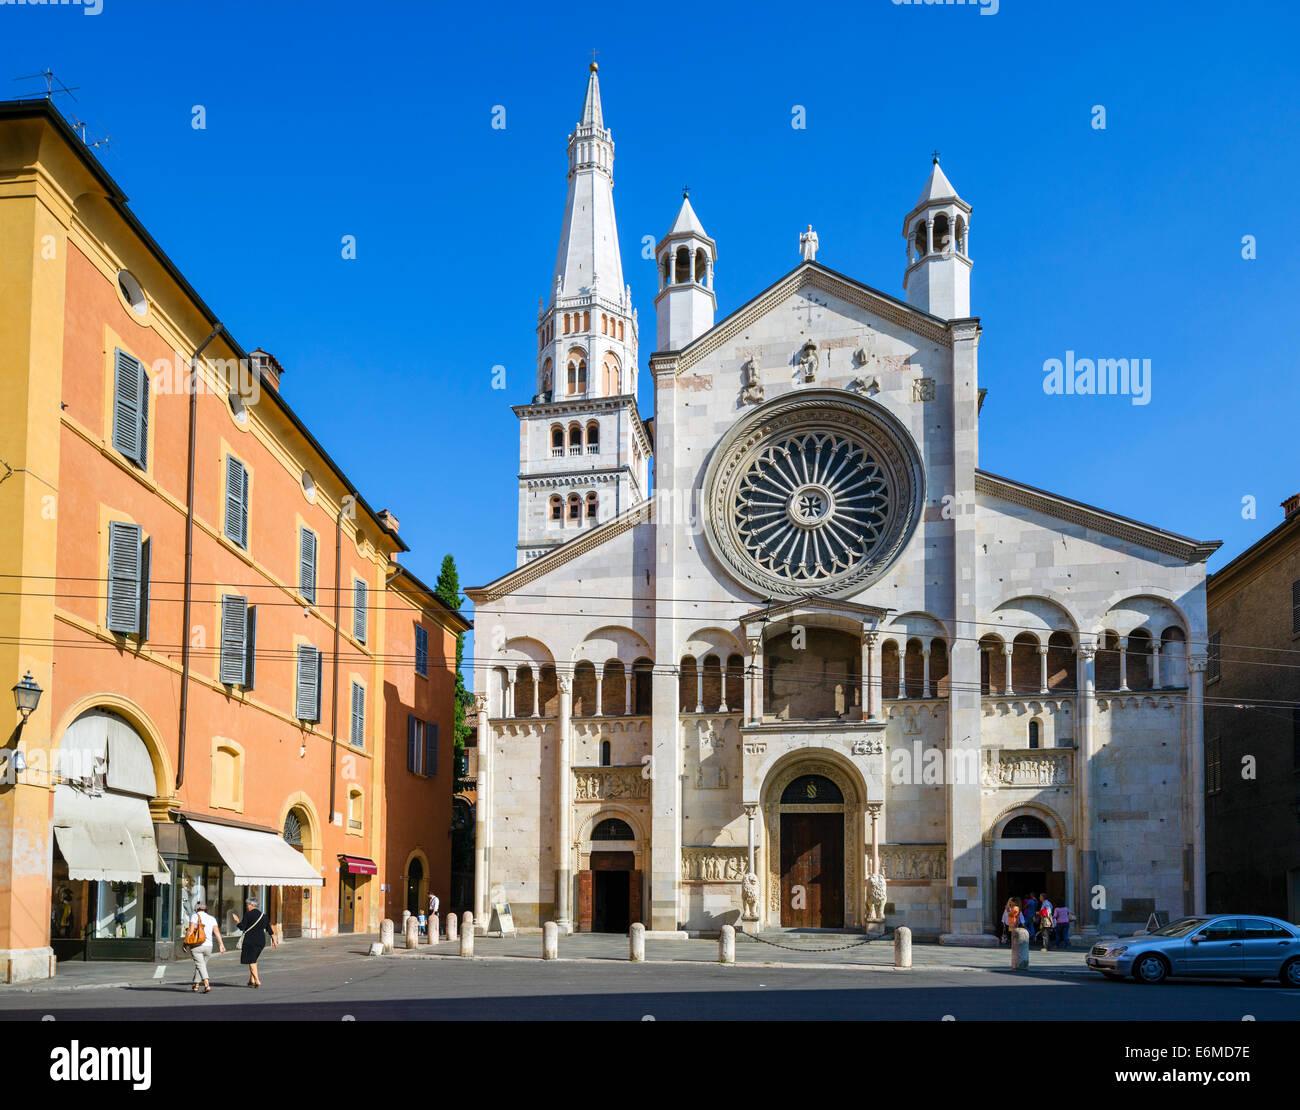 The western facade of the Duomo, Piazza Duomo, Modena, Emilia Romagna, Italy - Stock Image